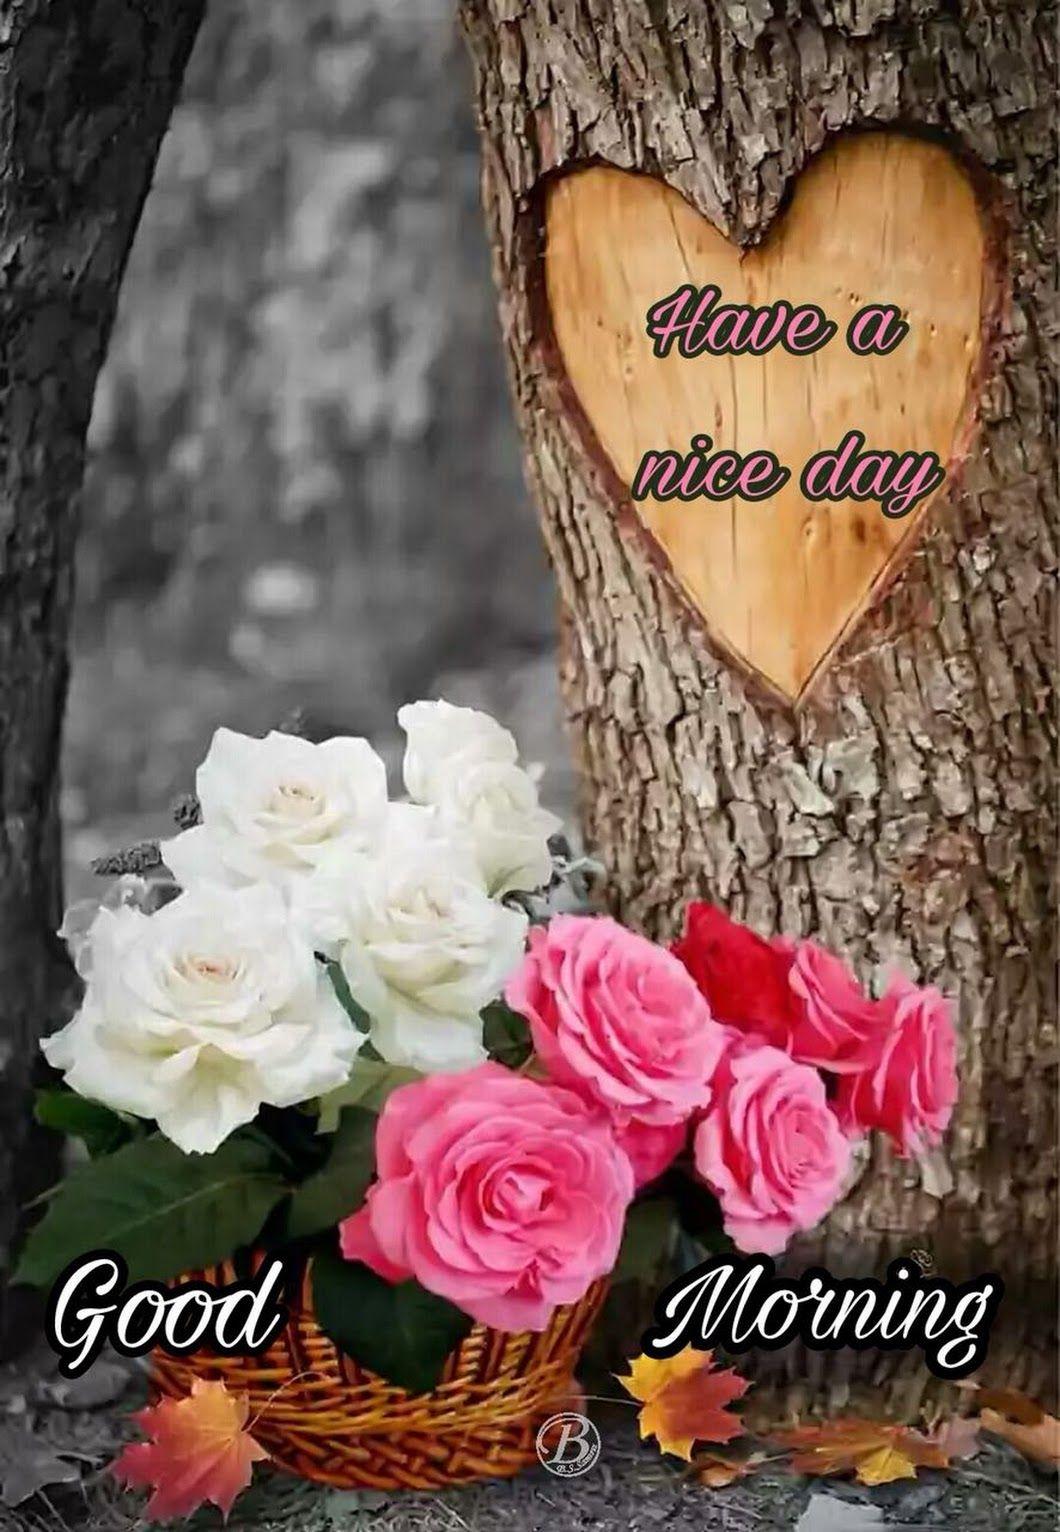 Good Morning Friends Have A Nice Day Balvinder Singh Samra